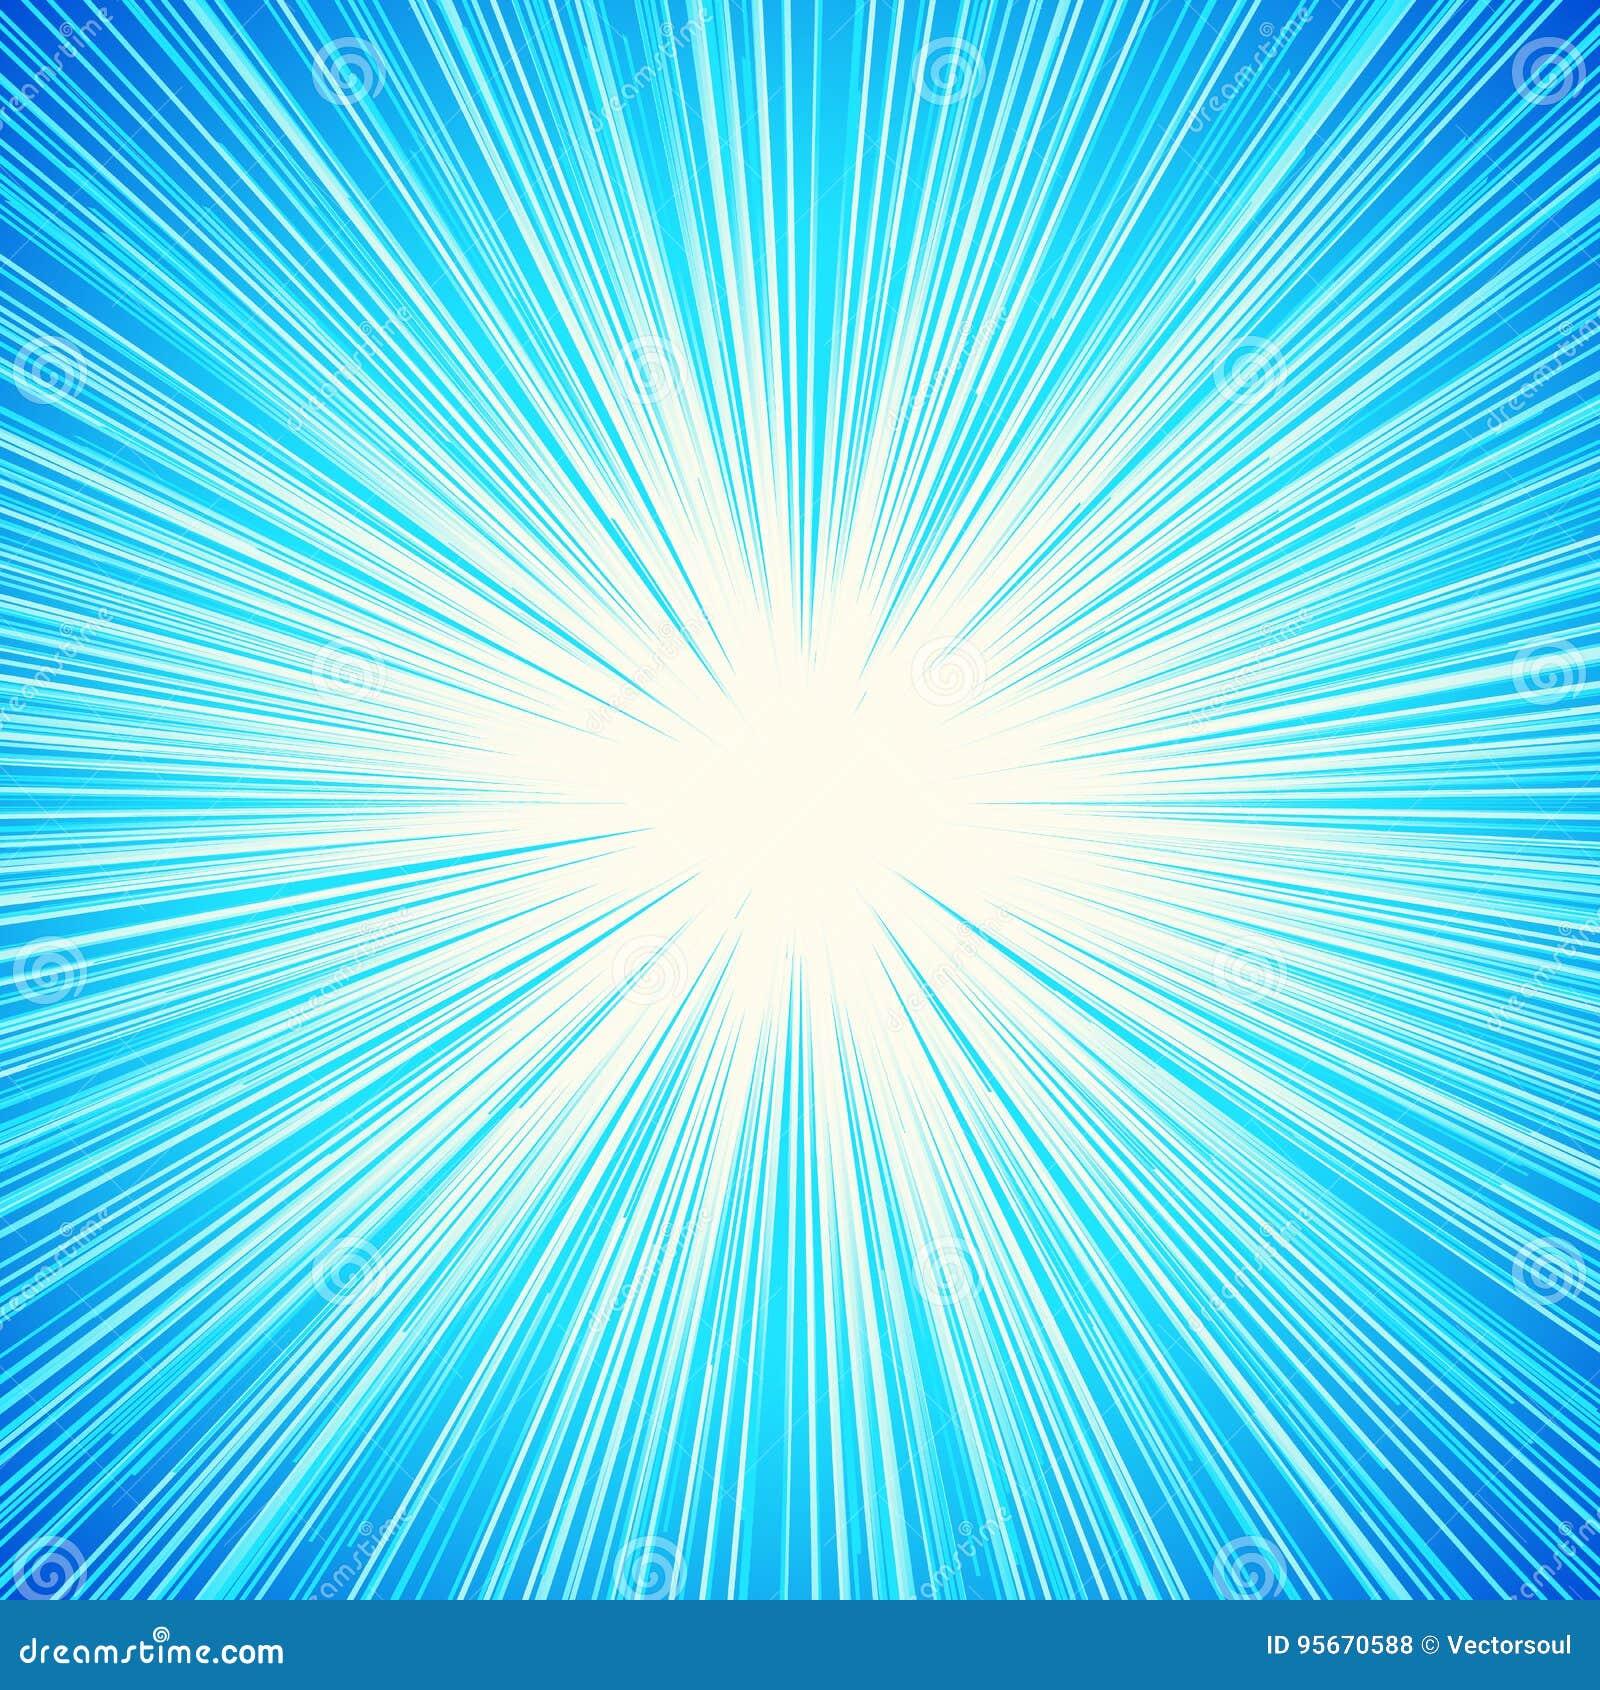 Starburst, Sunburst, Rays Of Light Element  Circular, Radial